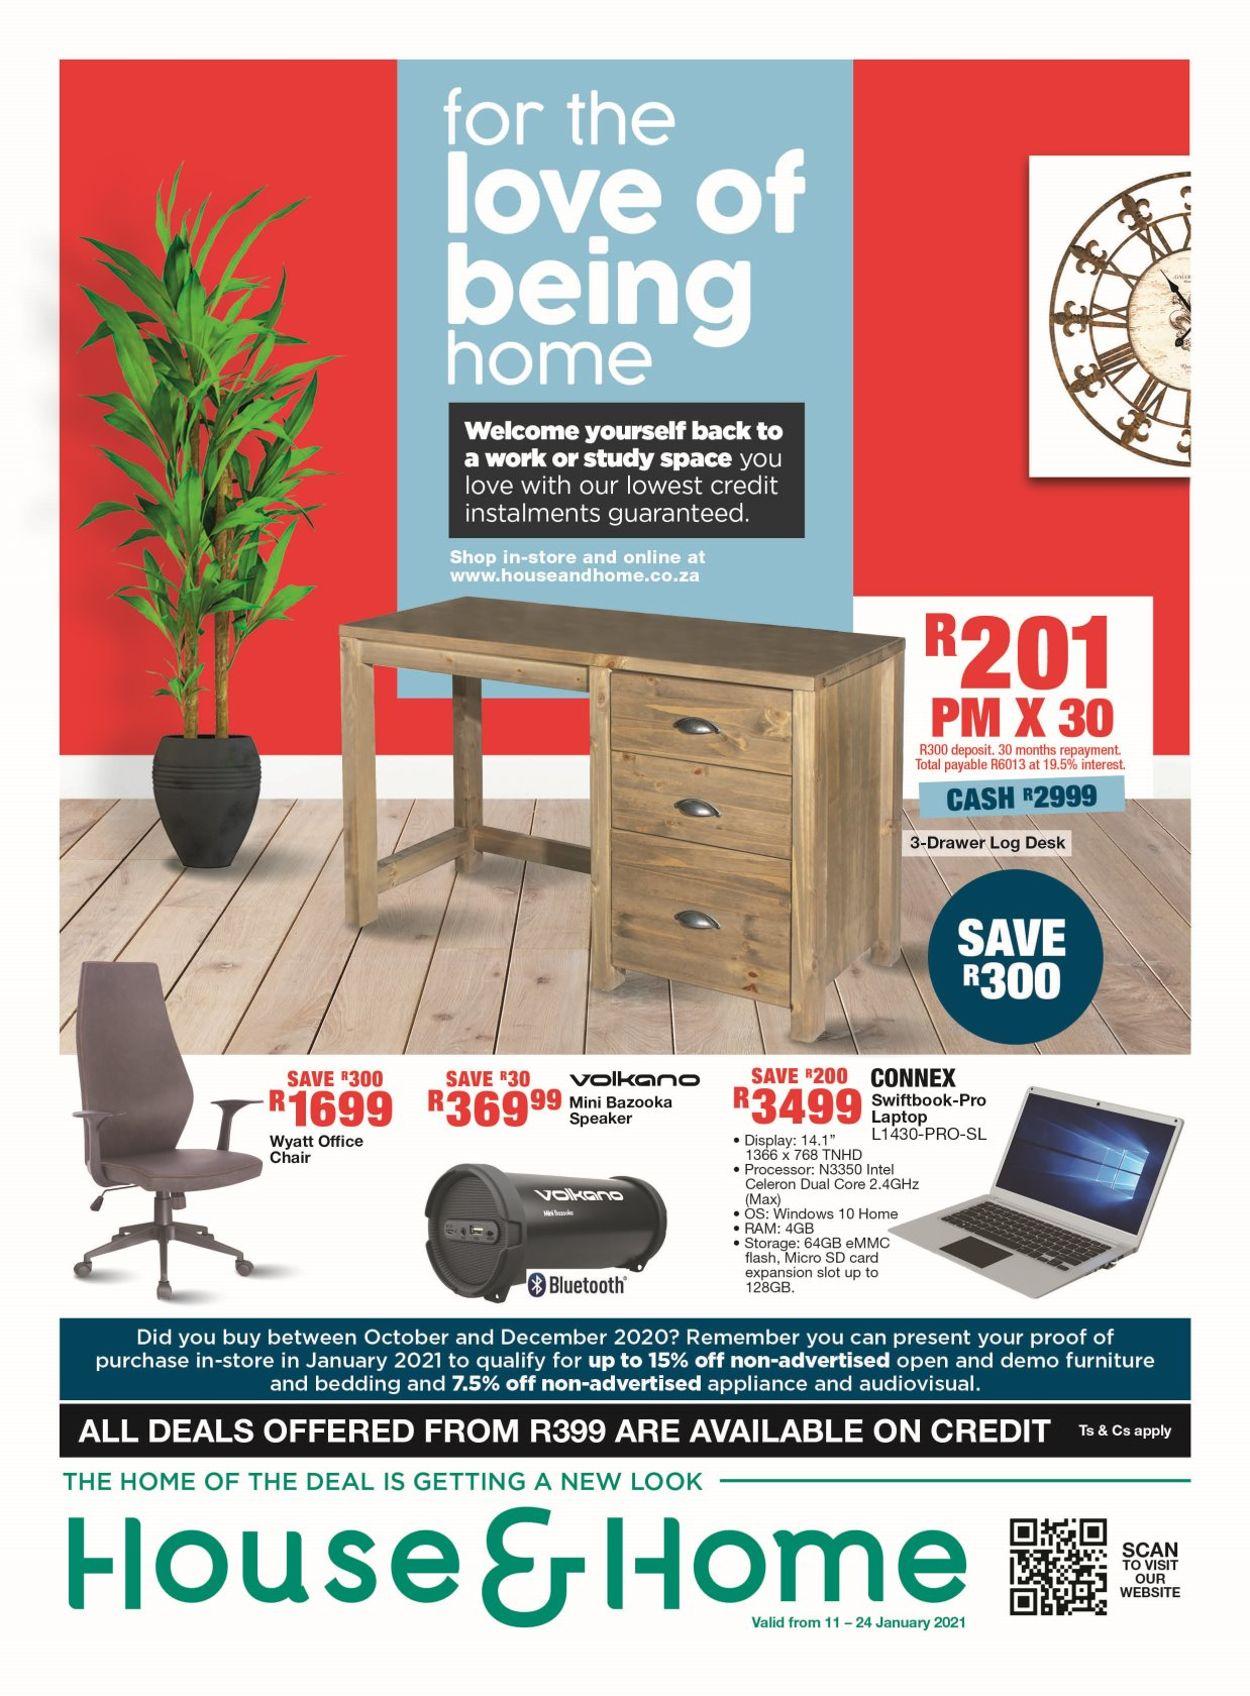 House & Home Catalogue - 2021/01/11-2021/01/24